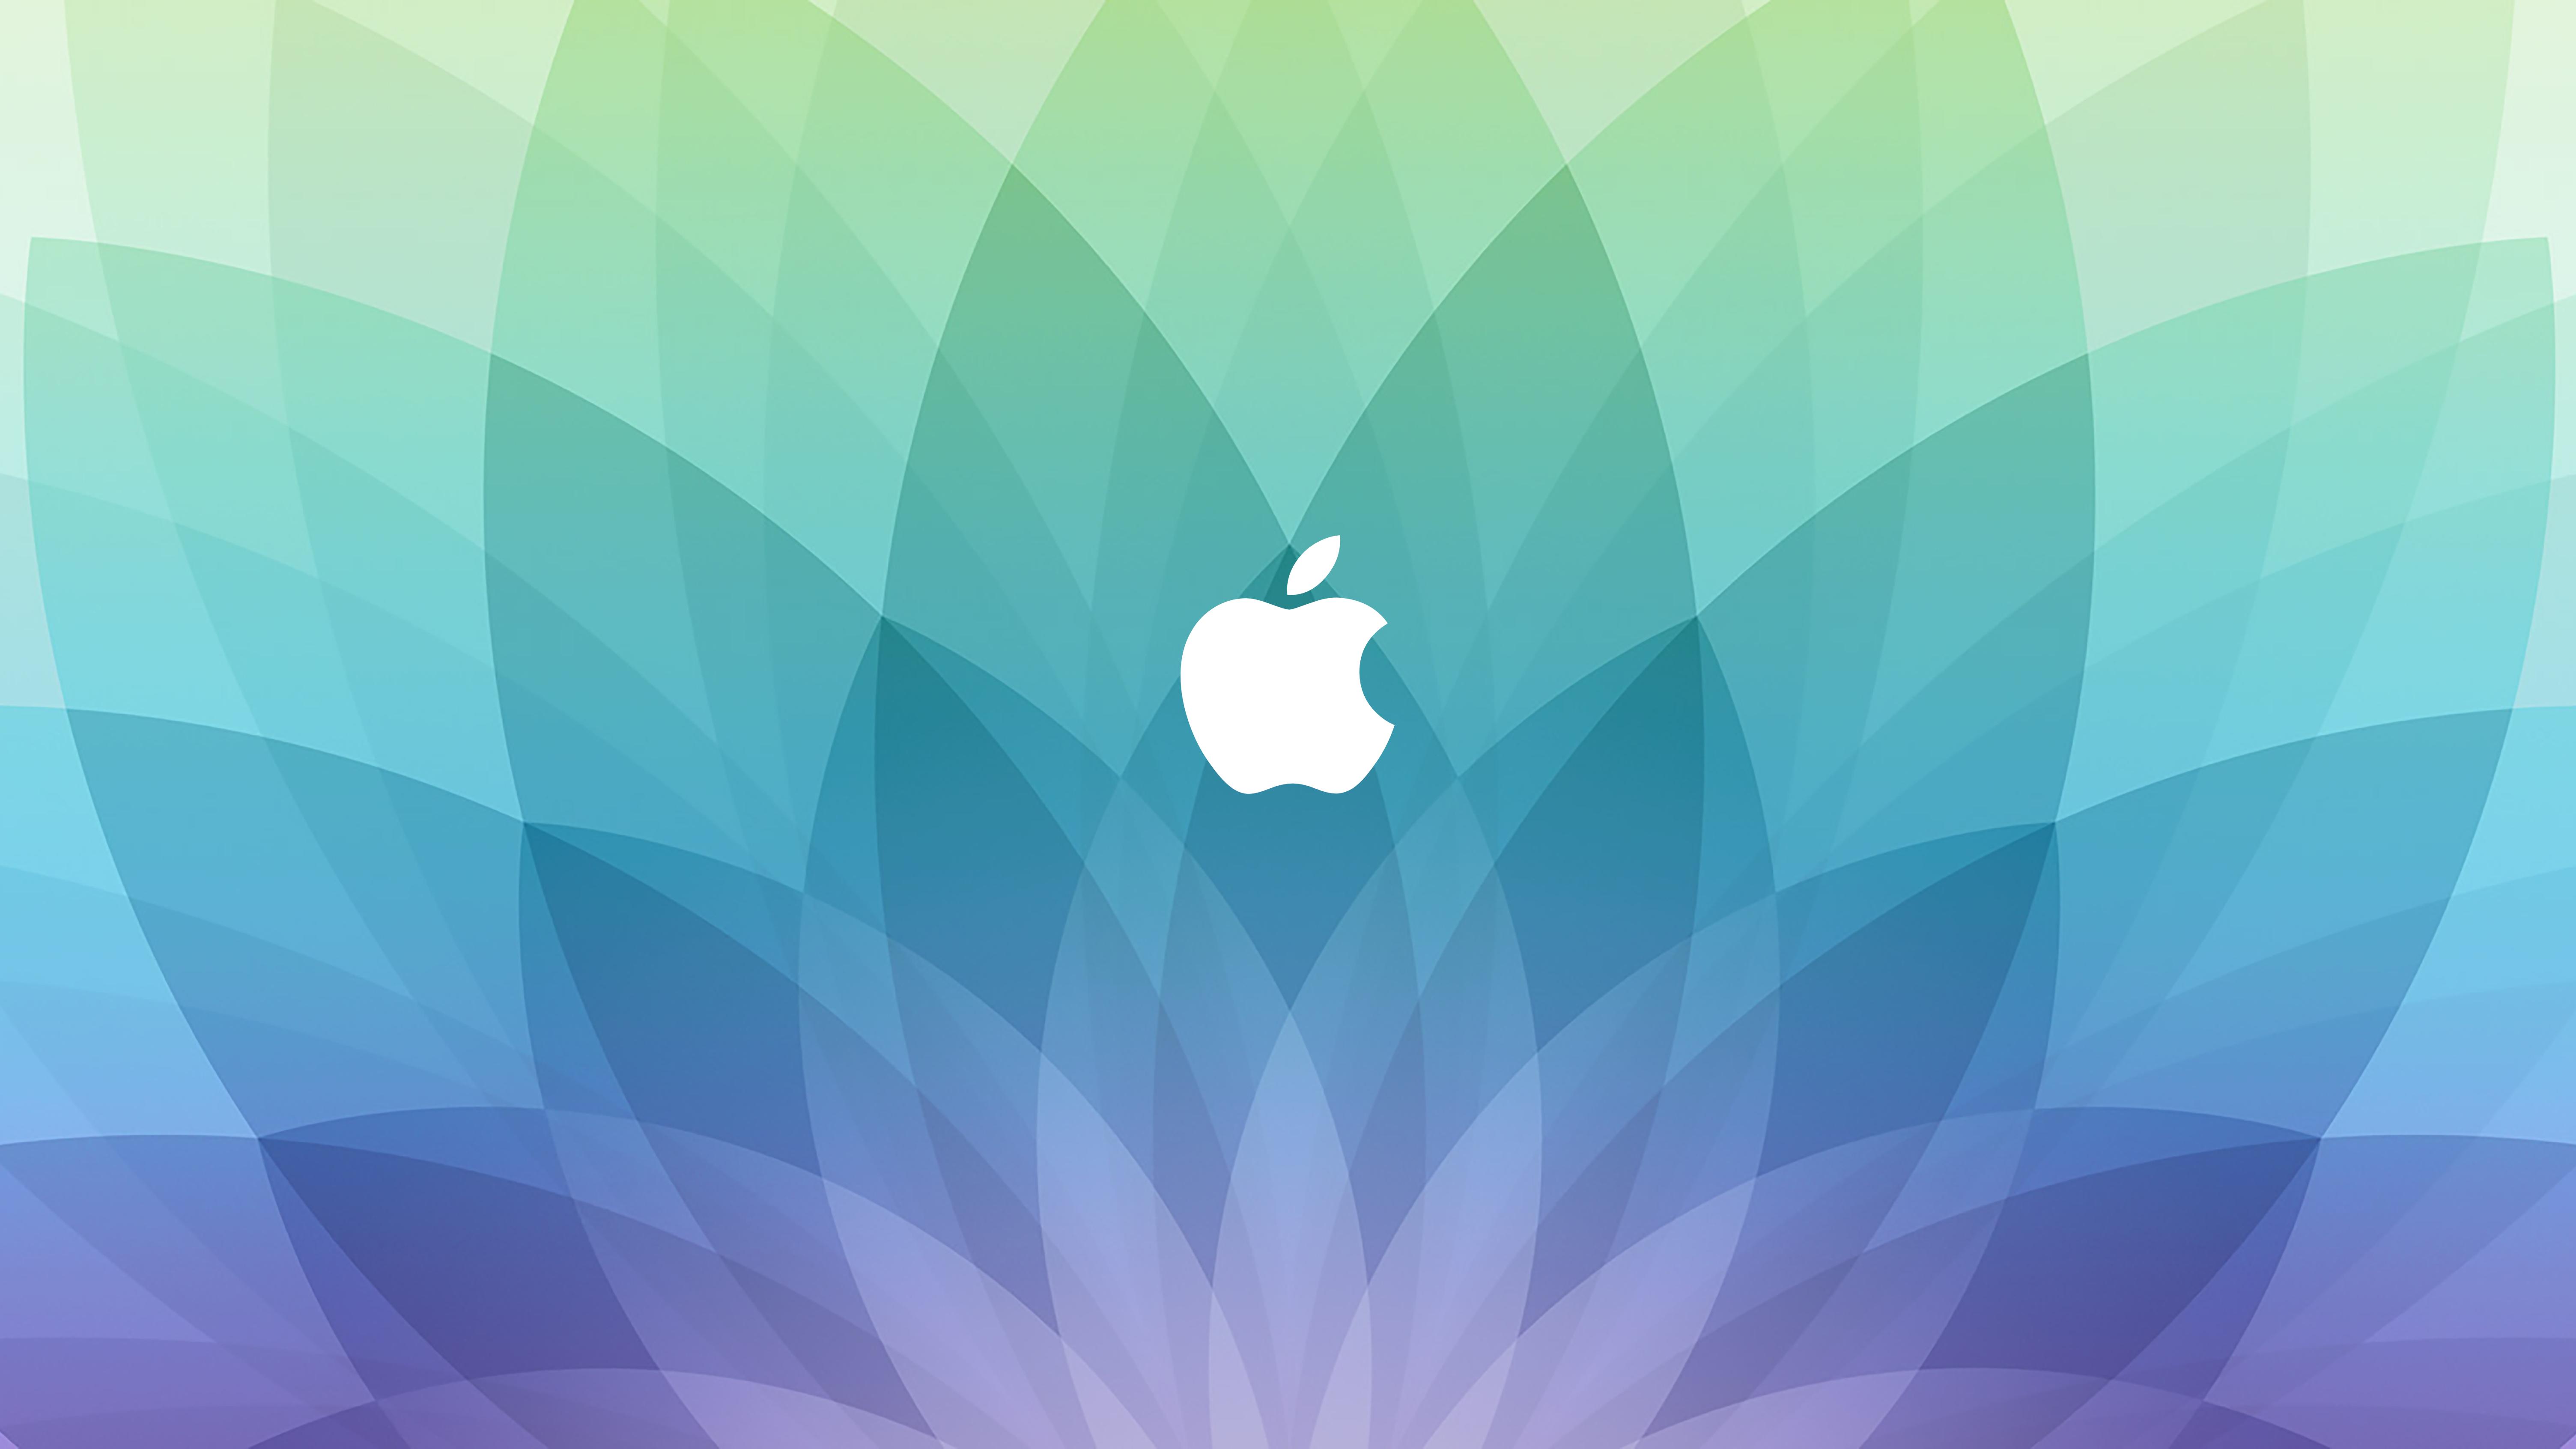 Free Desktop Hd Ipad Iphone Wallpapers: Apple Watch Event Wallpapers: Spring Forward